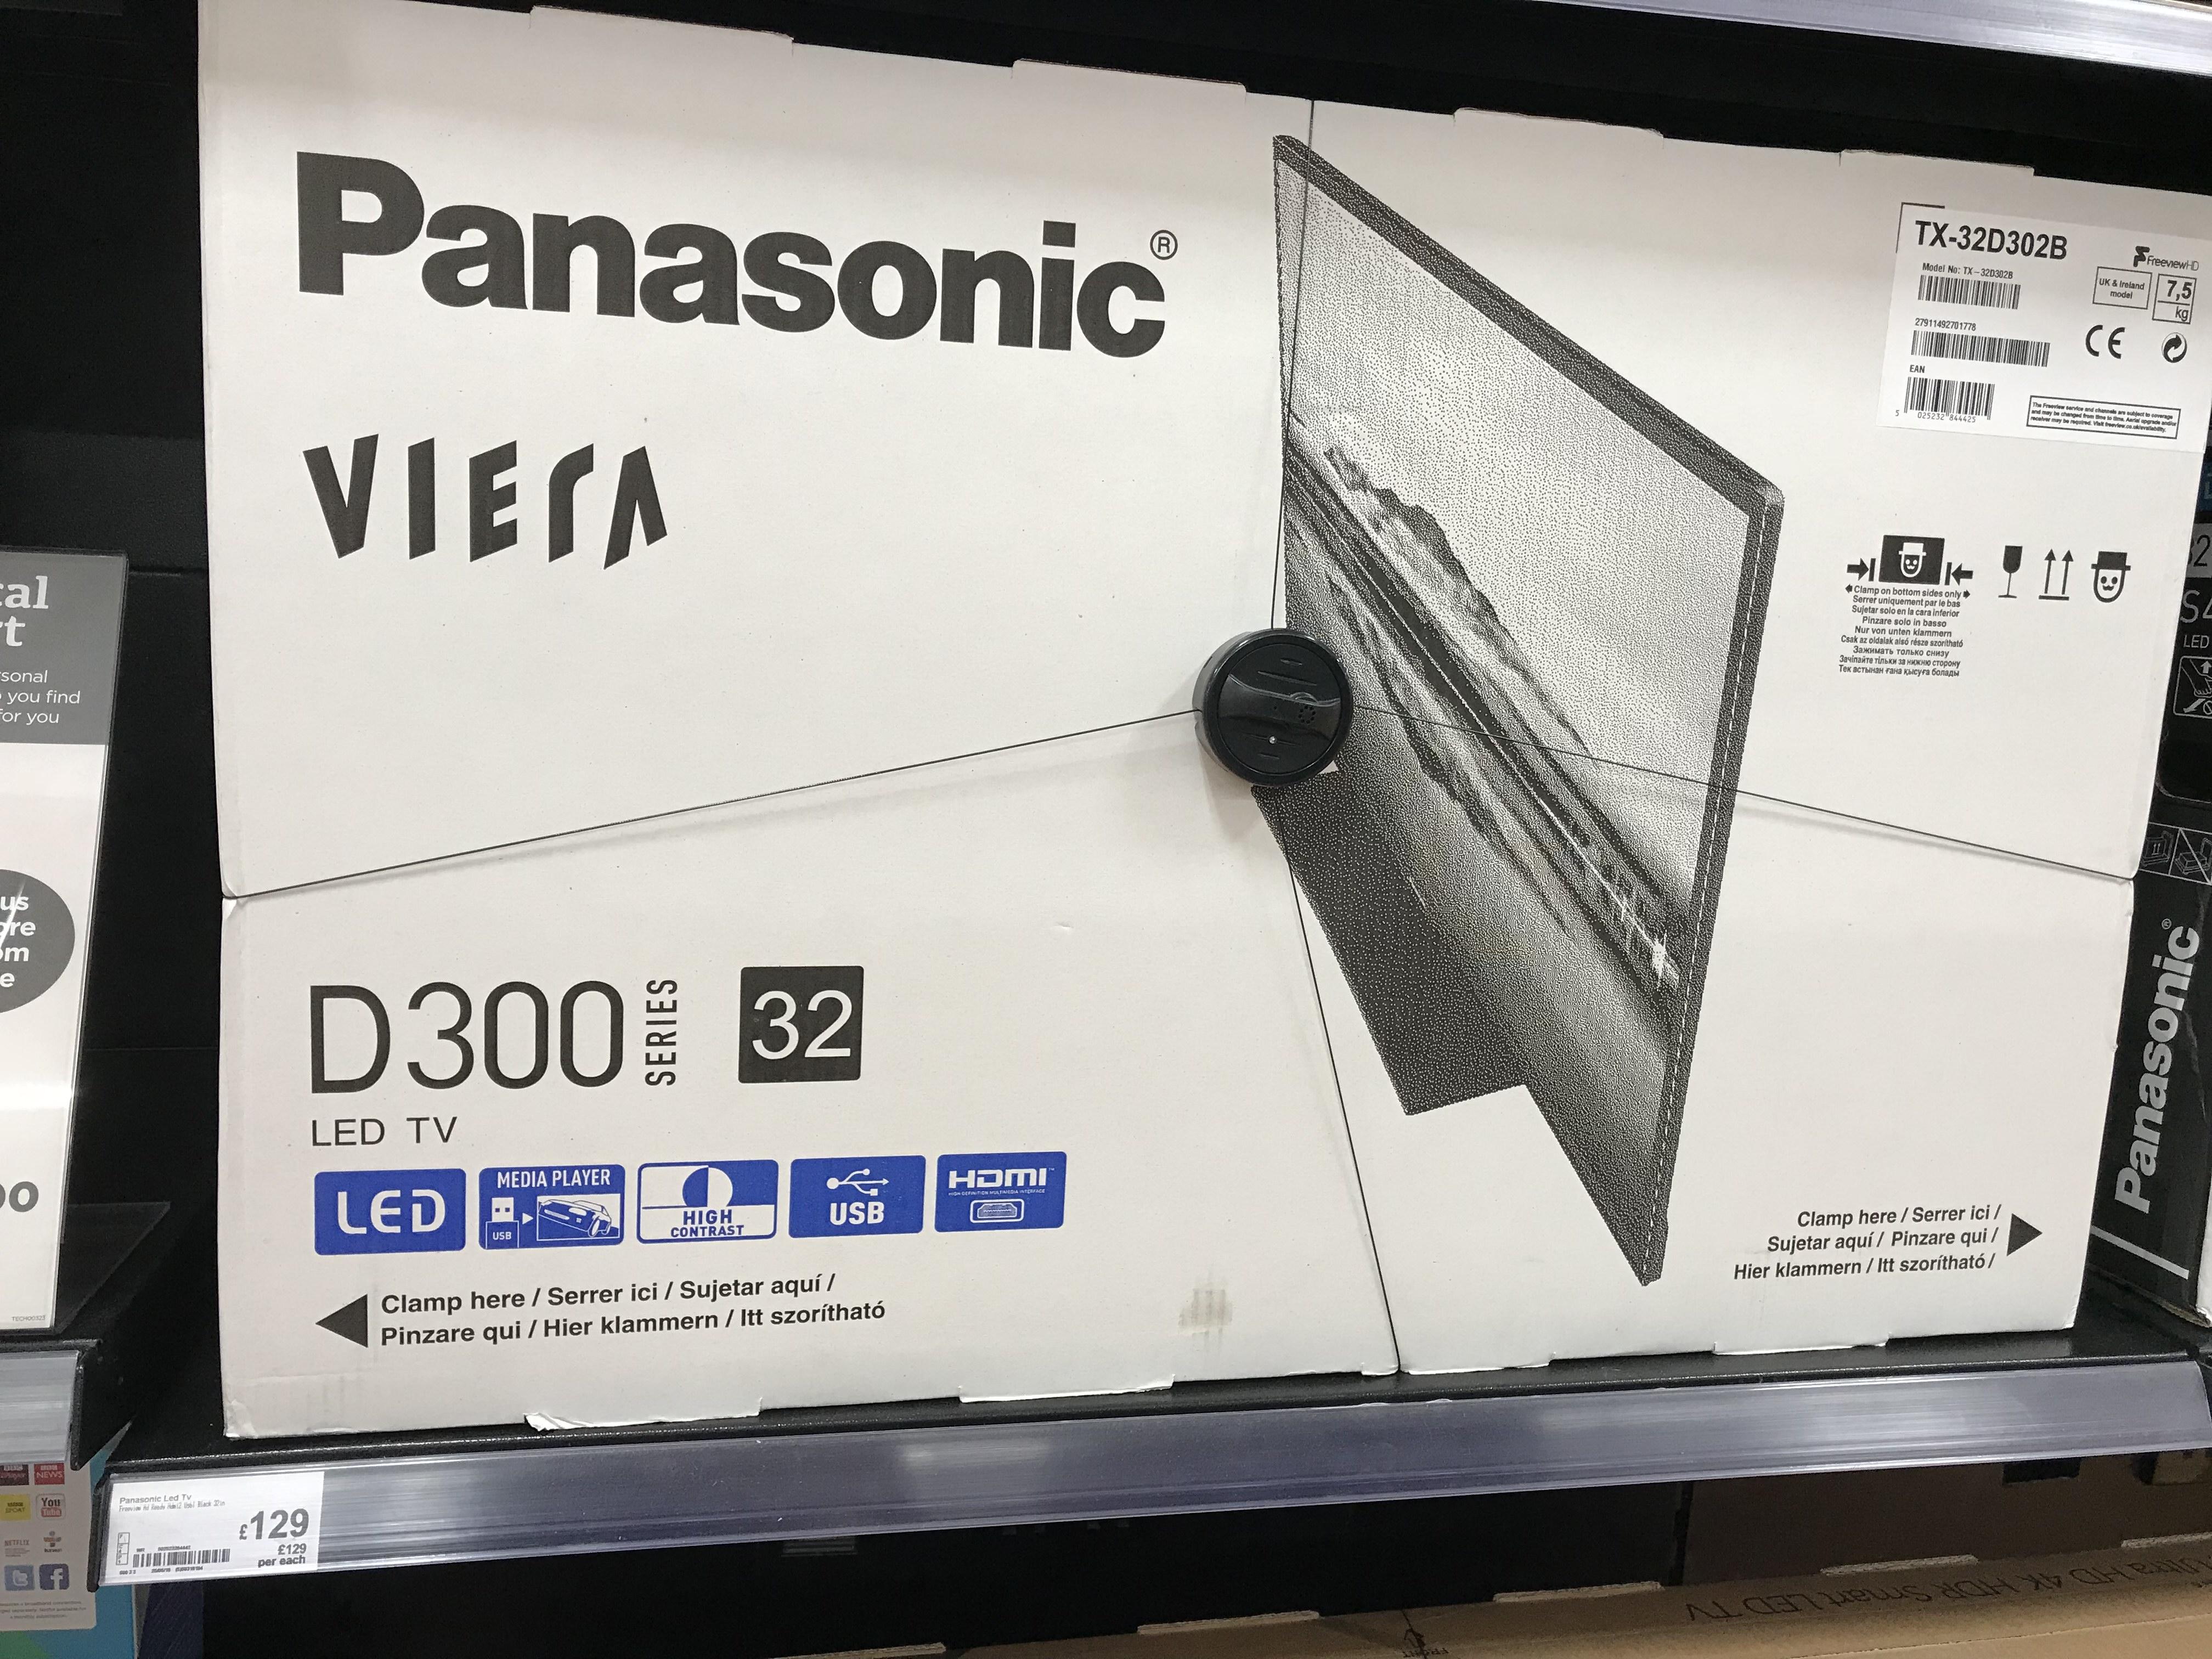 "Panasonic Viera Tv 32"" TX-32D302B £129 @ Asda Pudsey, Leeds"